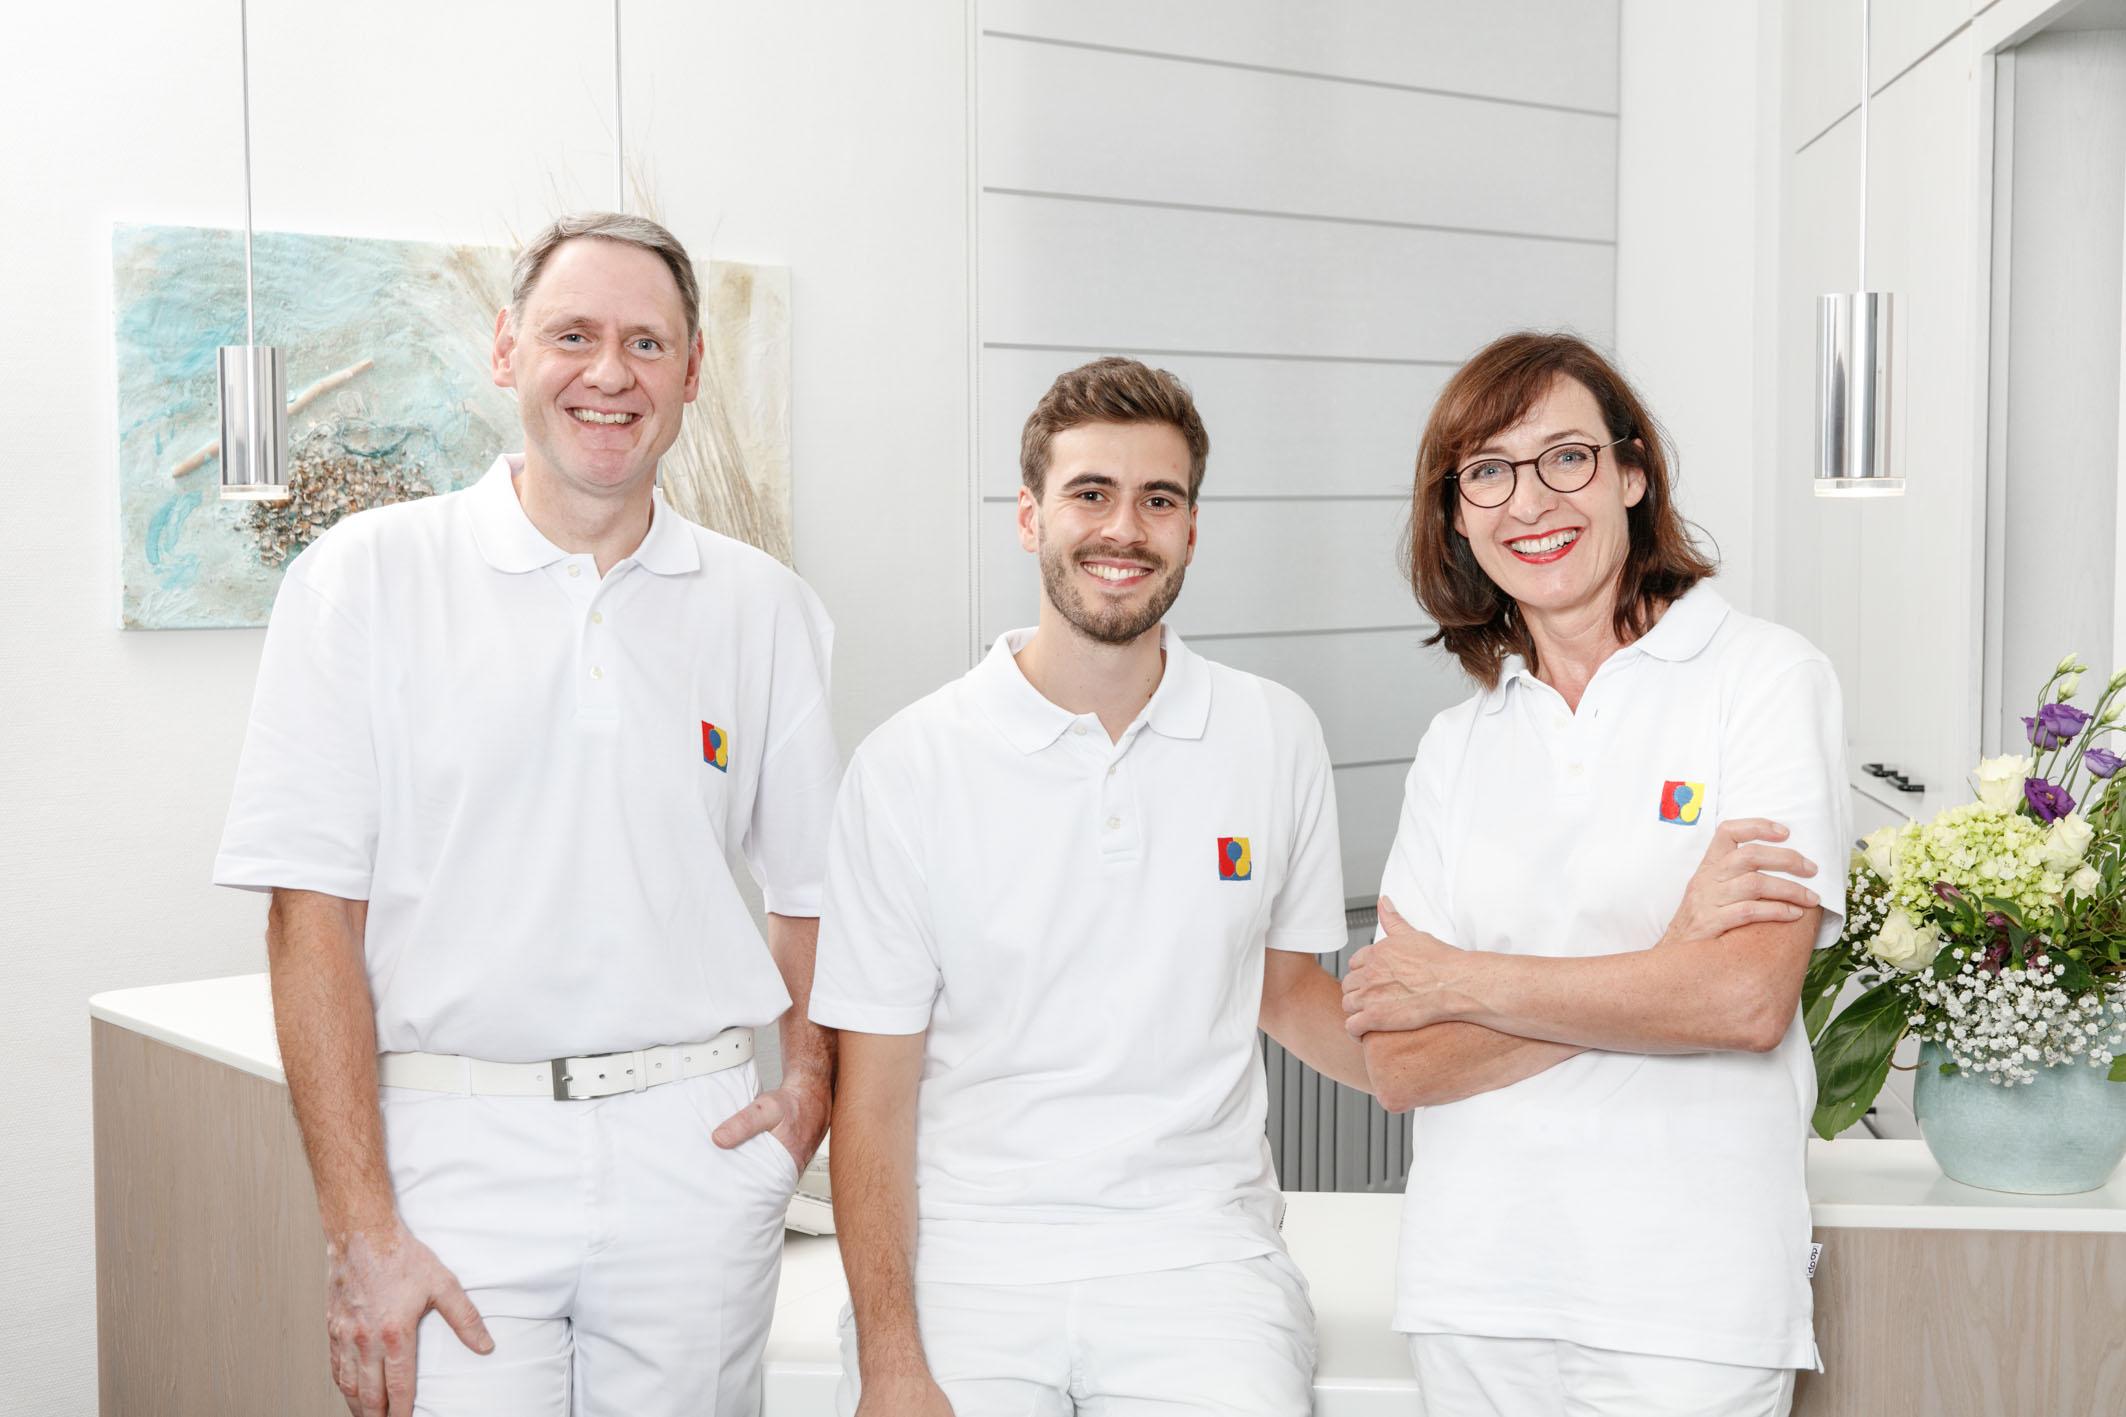 Dr. Prof. Tischert | Zahnarzt Conrad Winkelmayer | Dr. Sabine Köhler